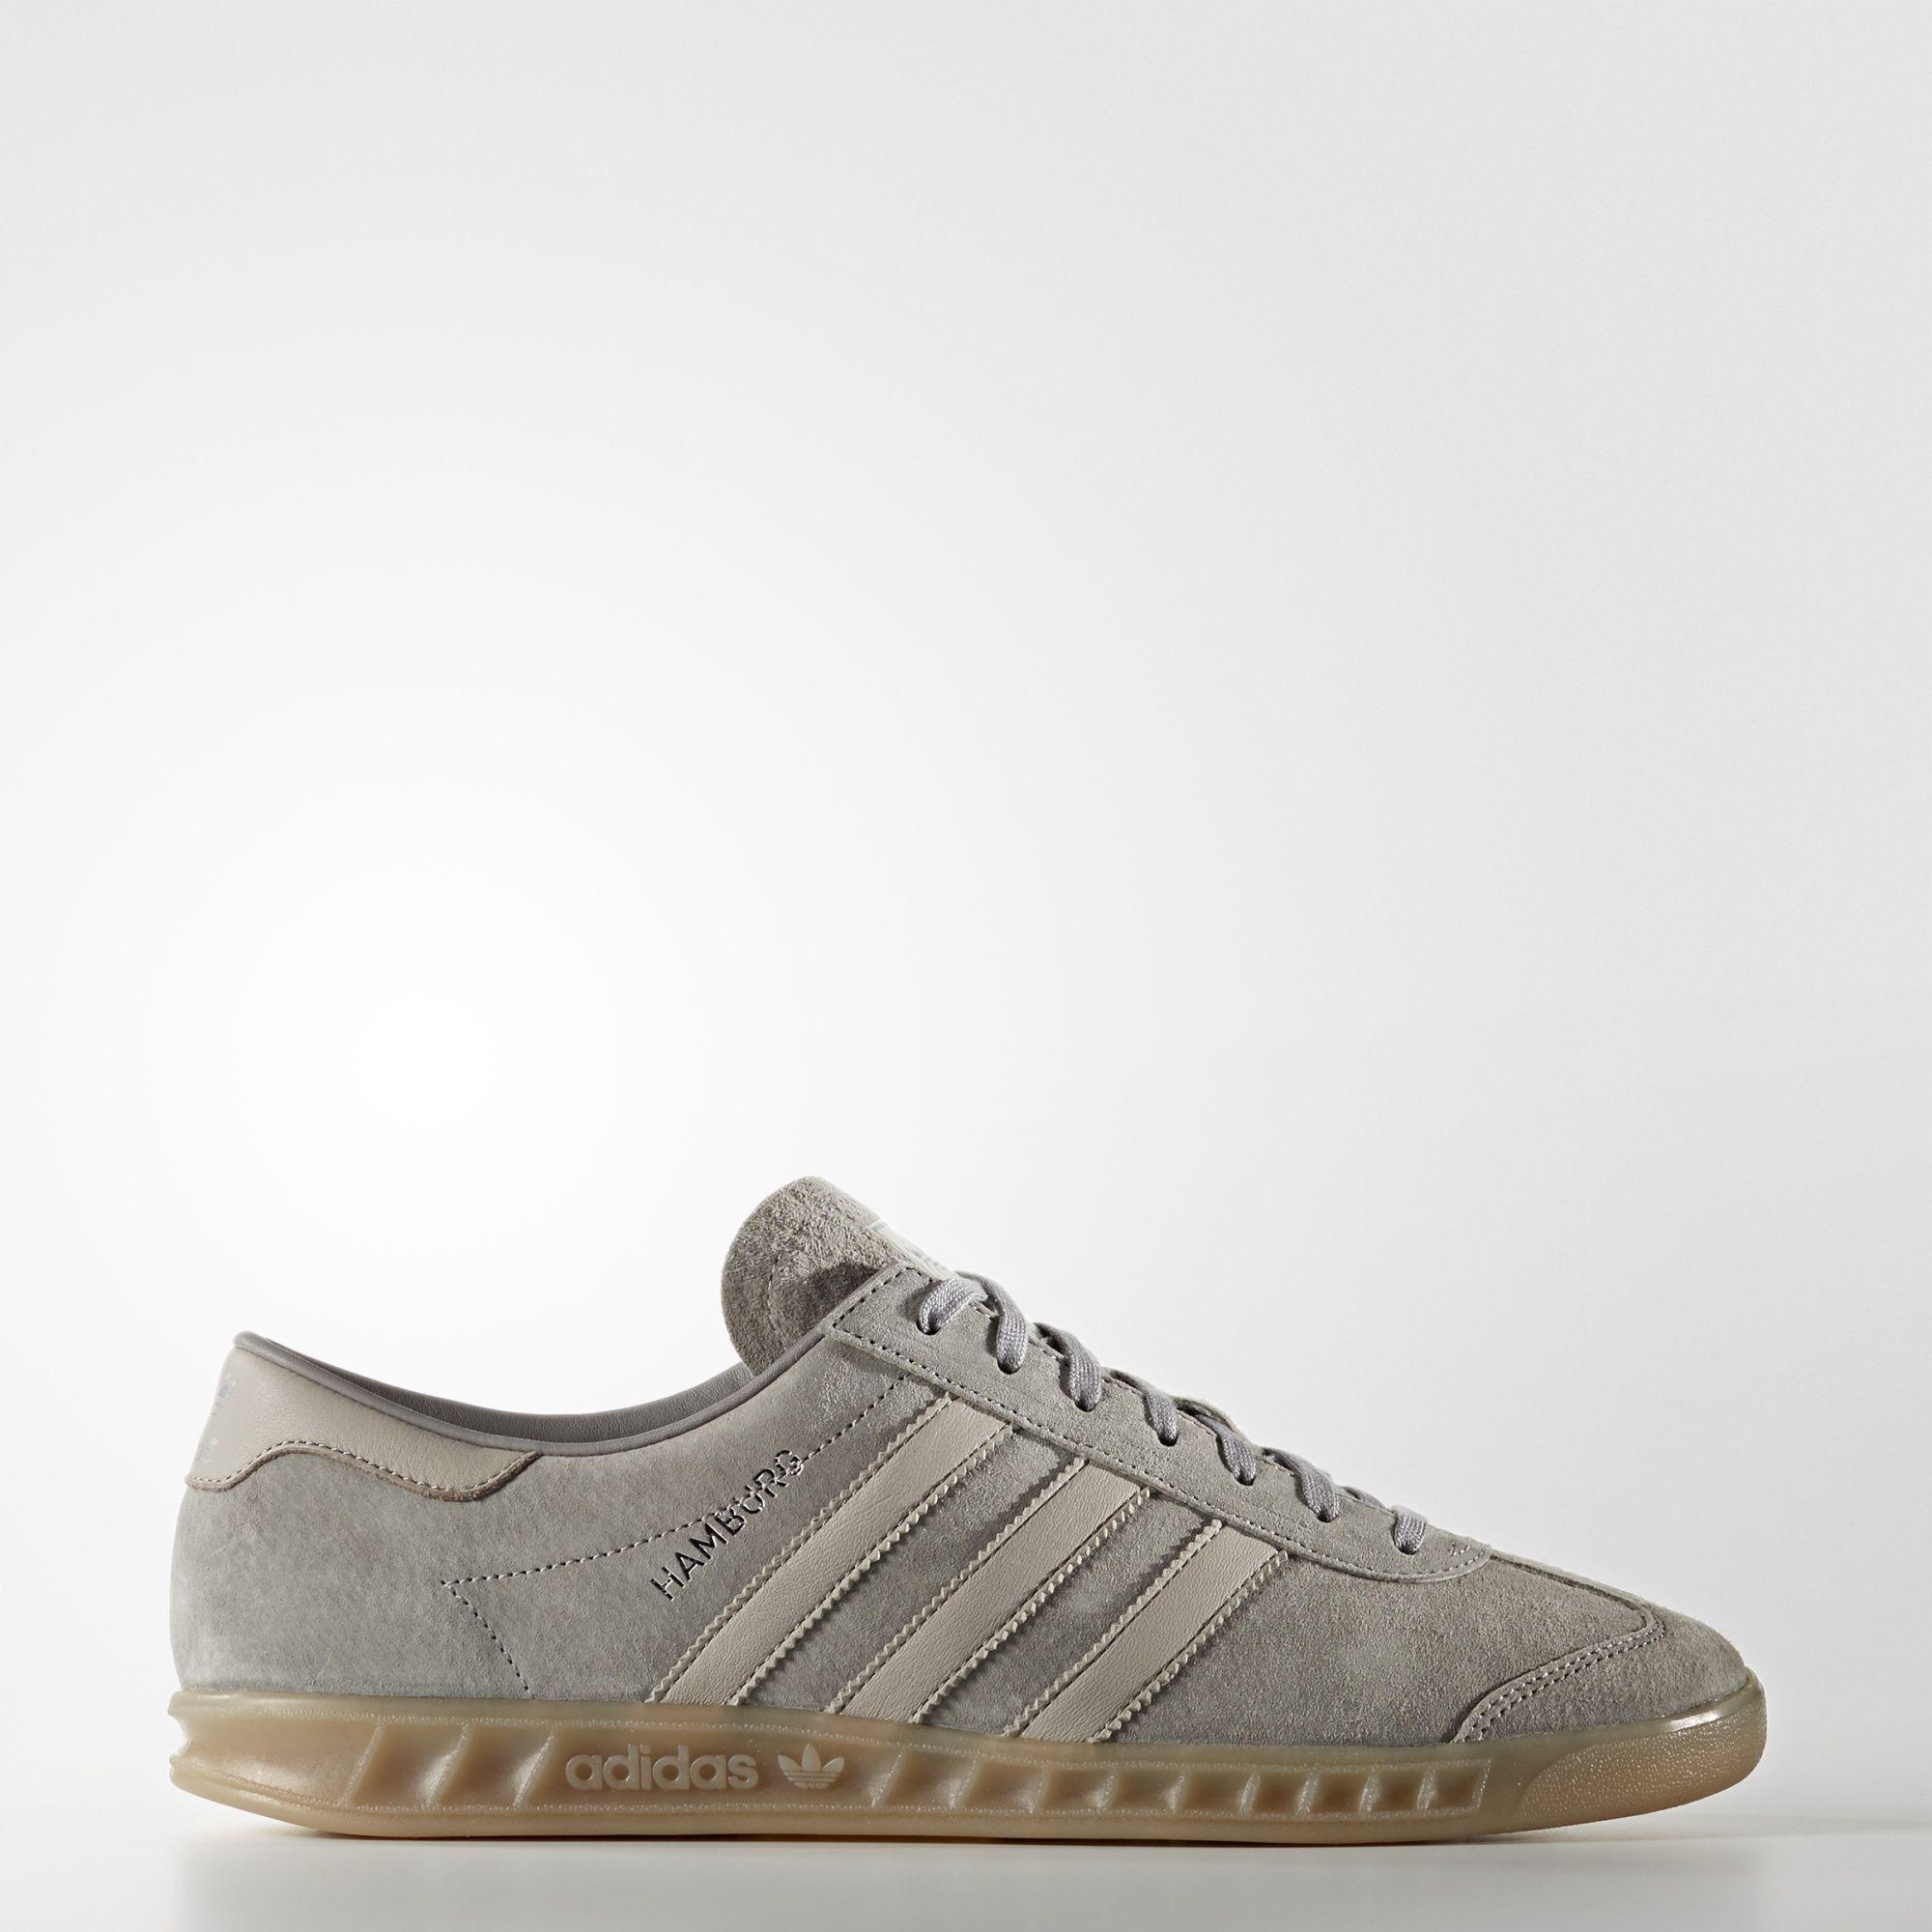 Original Store Adidas Originals Hamburg Clear Brown for Women